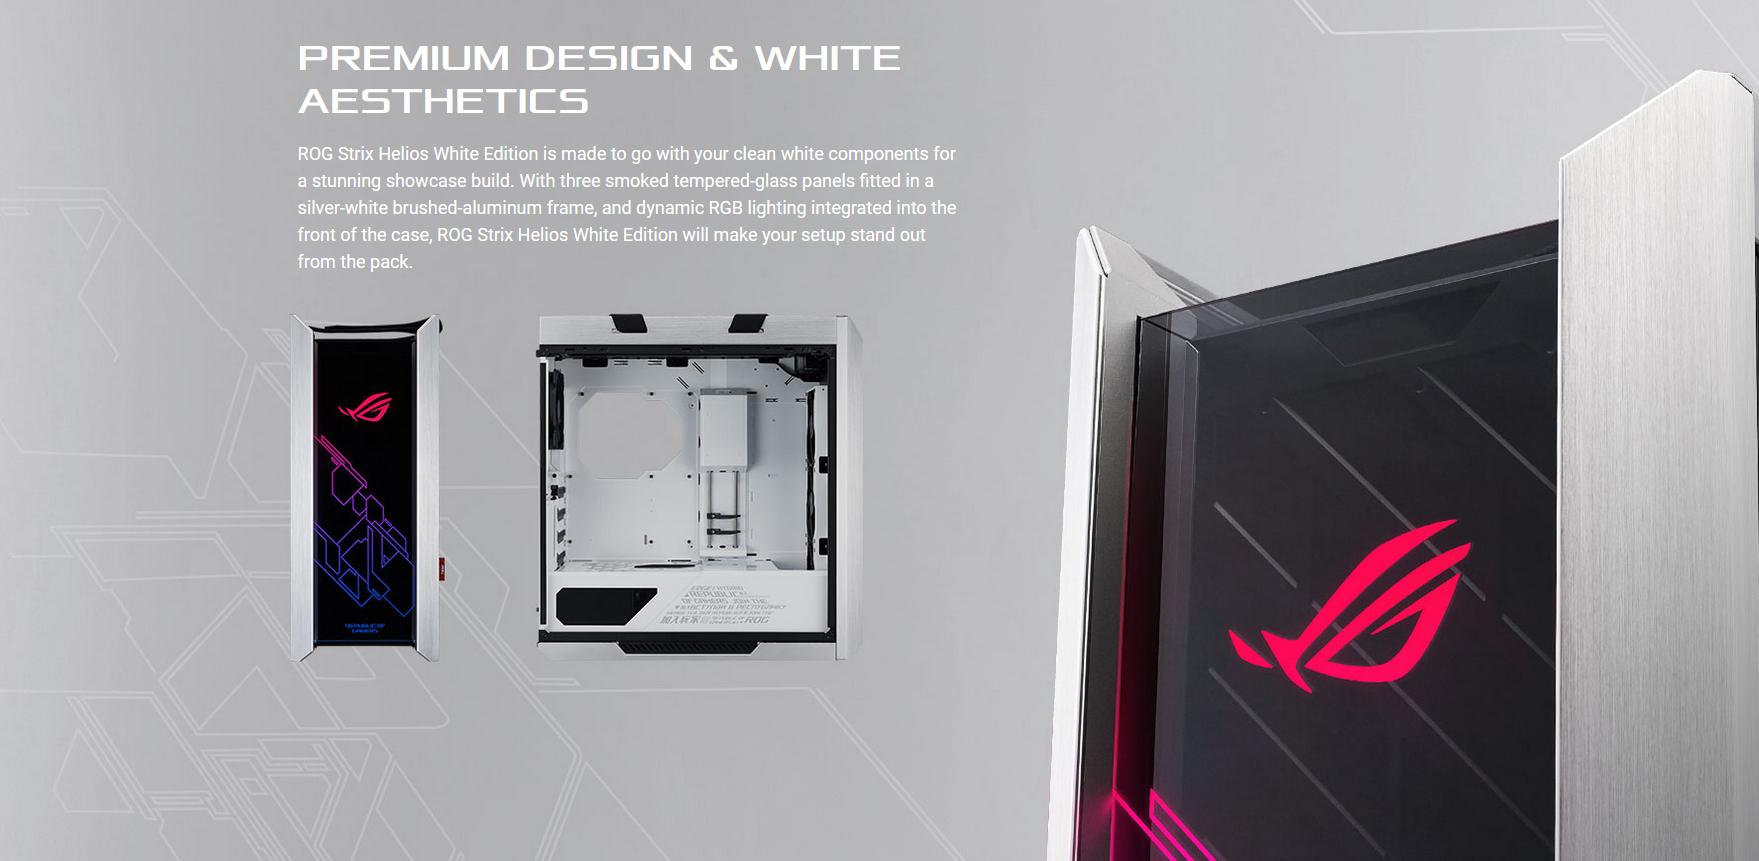 ASUS ROG Strix Helios GX601 White Edition (Mid Tower/Màu Trắng) giới thiệu 4